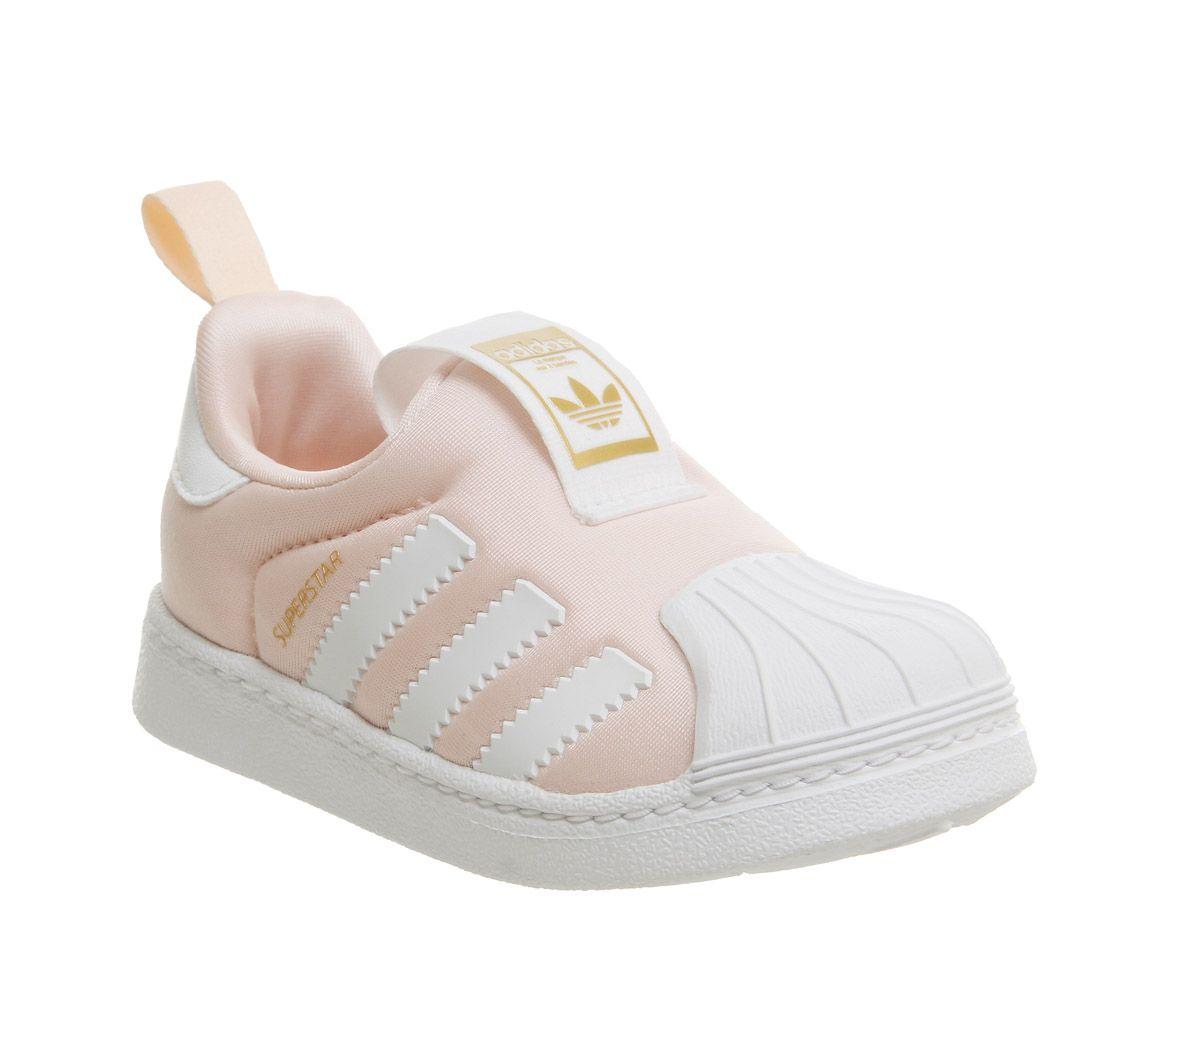 Adidas Adidas Superstar 360 I Kinder Sportschuhe